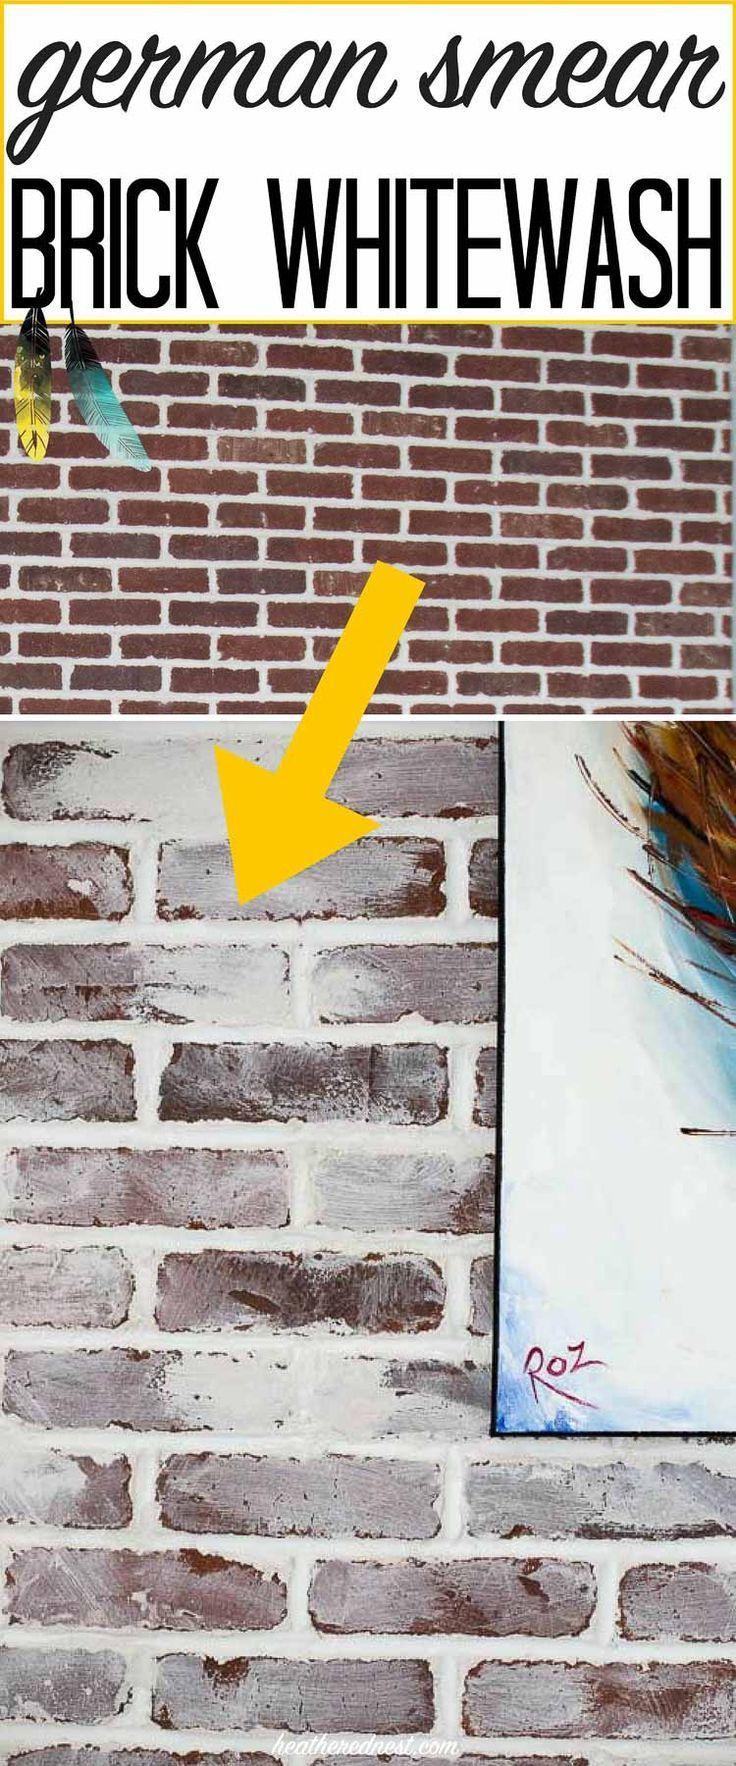 German Smear DIY Whitewash Brick Technique AKA Shiing bricks